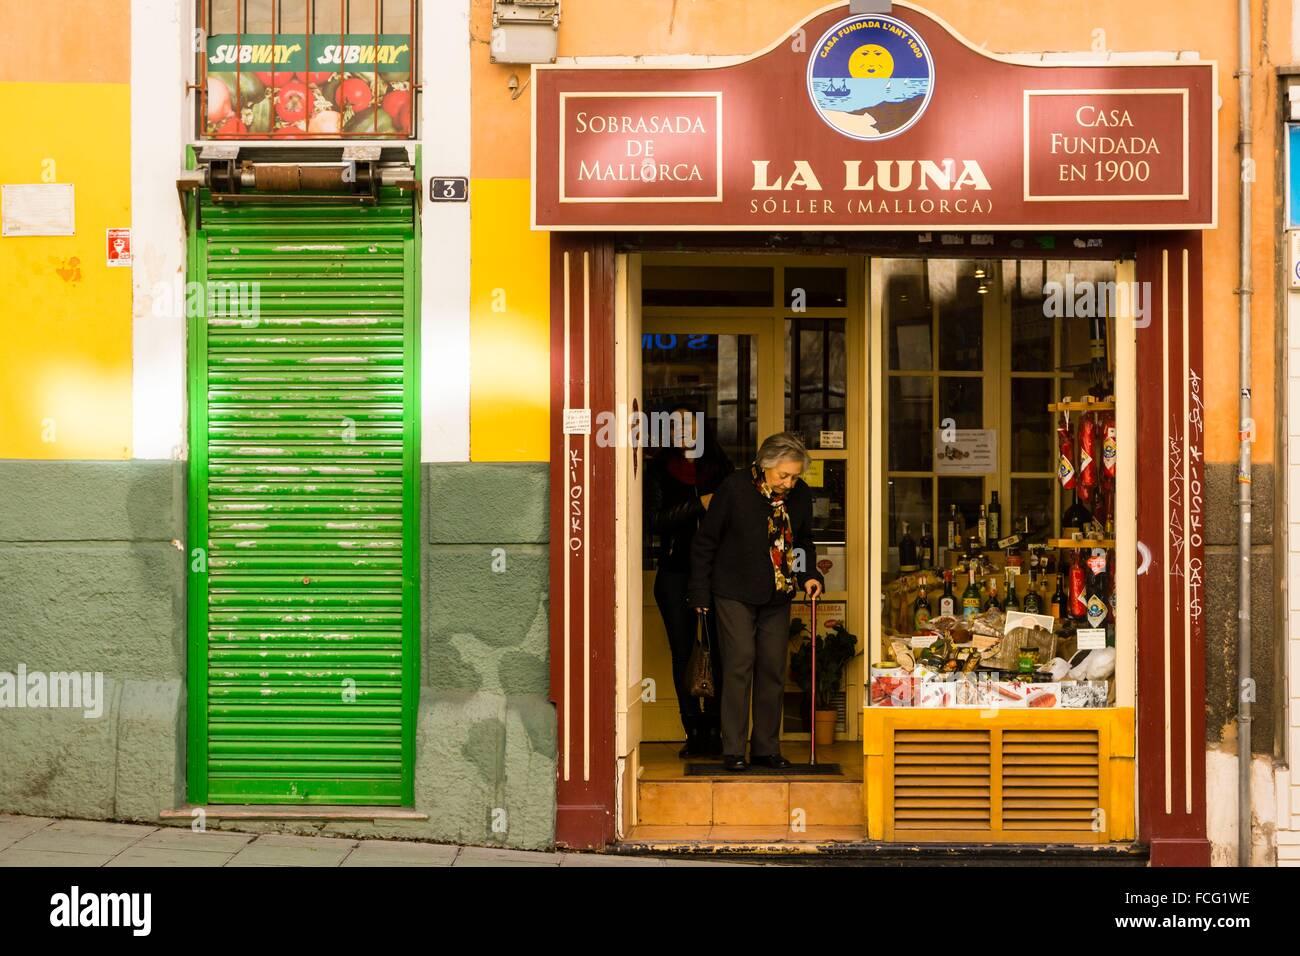 fachada de la tienda La Luna, Palma, Mallorca, balearic islands, spain, europe. - Stock Image